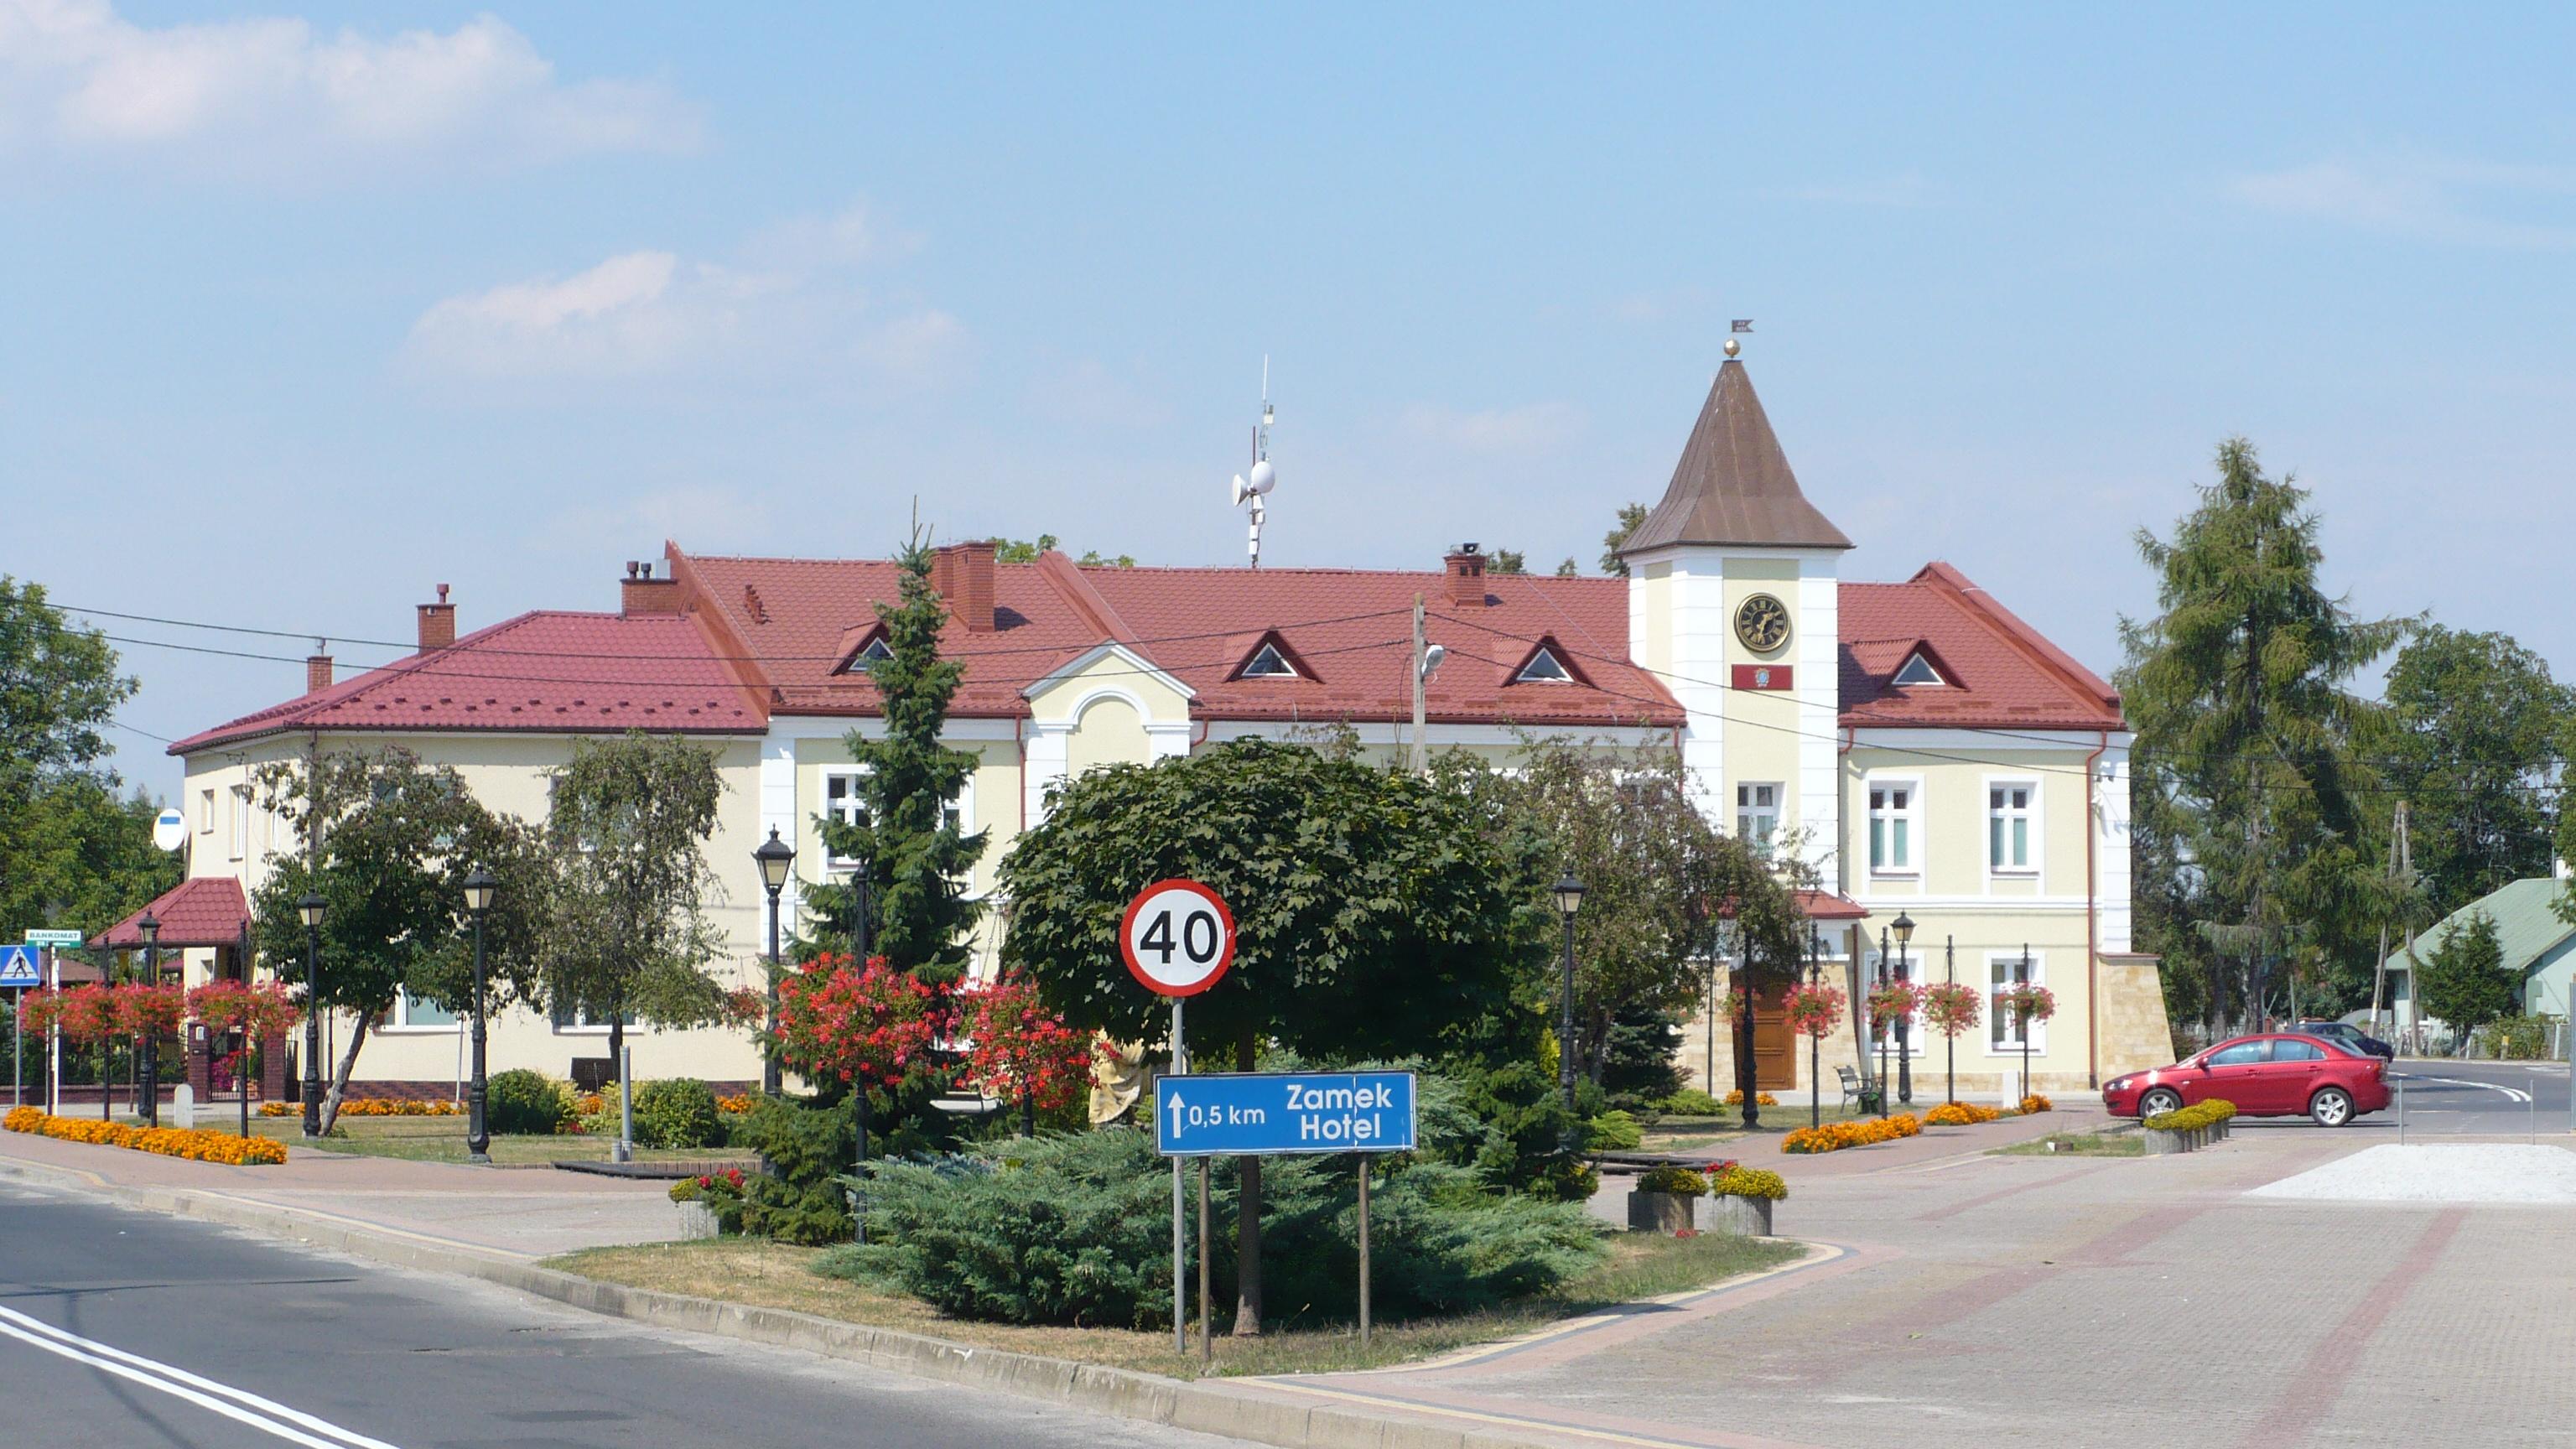 Baranow City